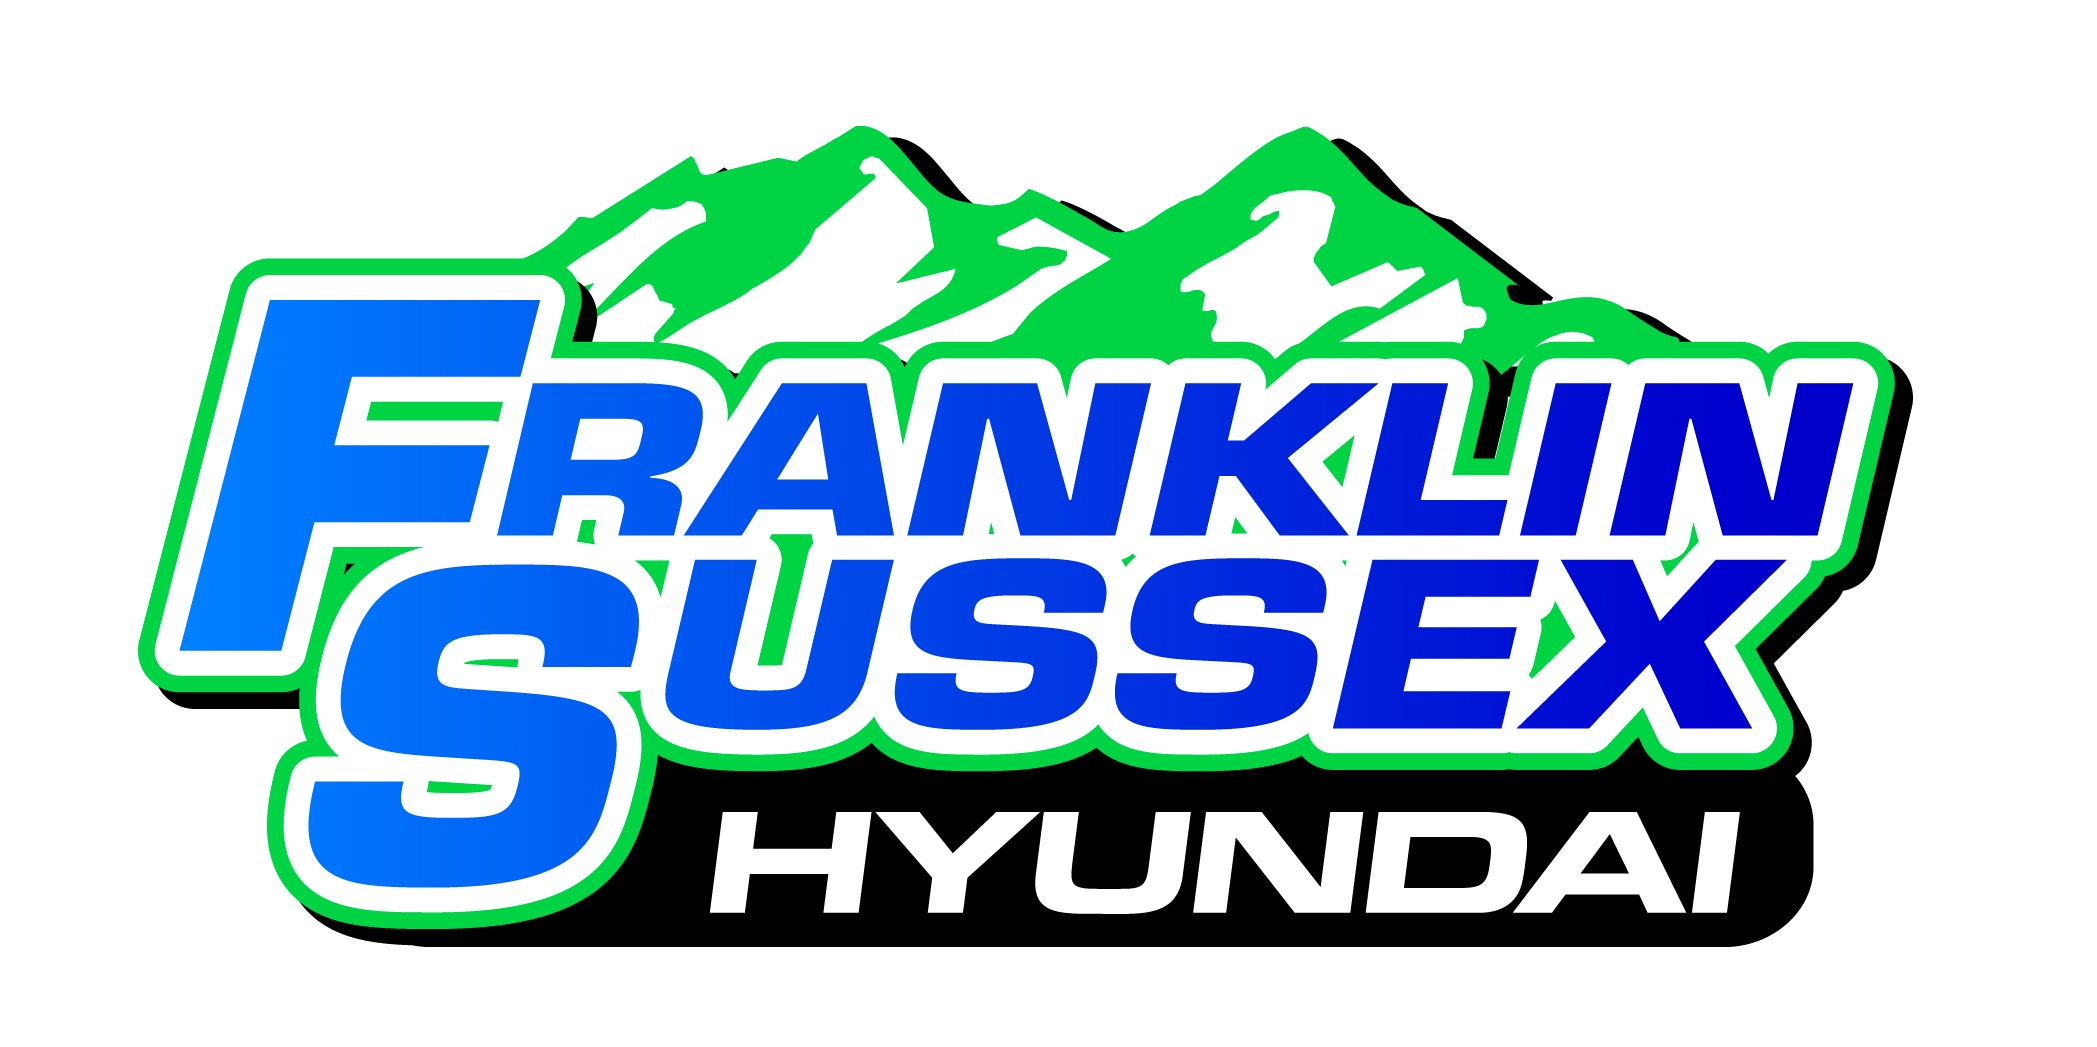 Franklin Sussex Hyundai